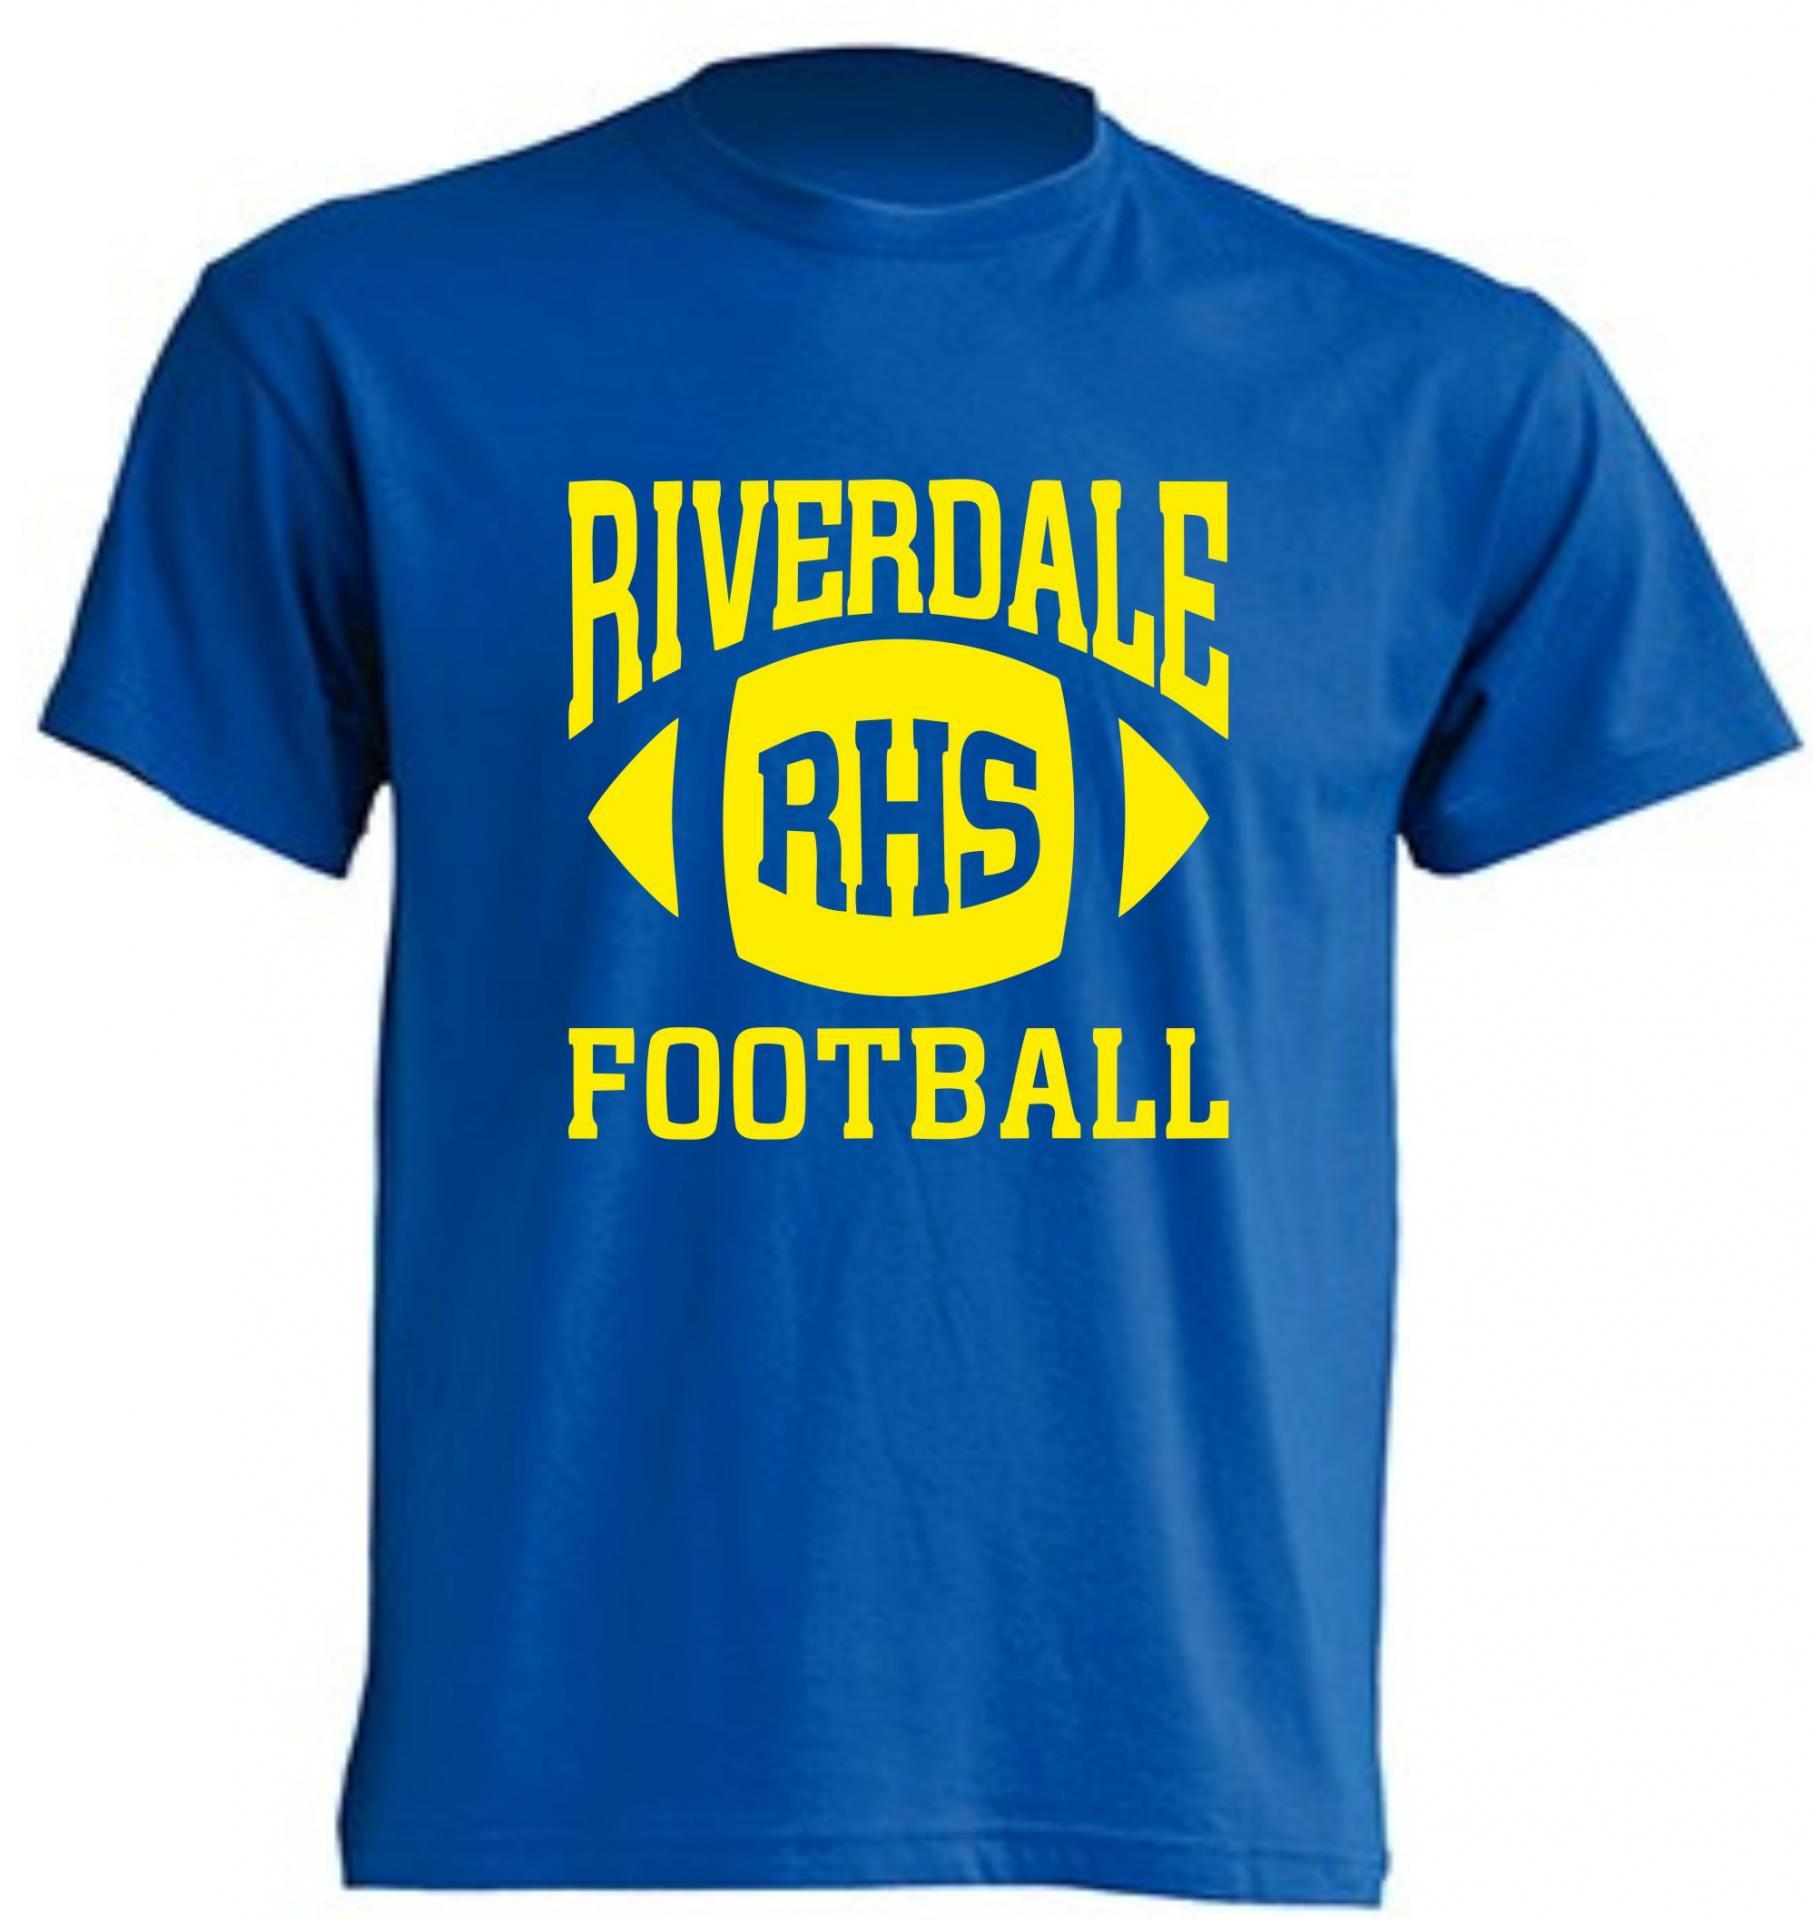 Camiseta Riverdale Football